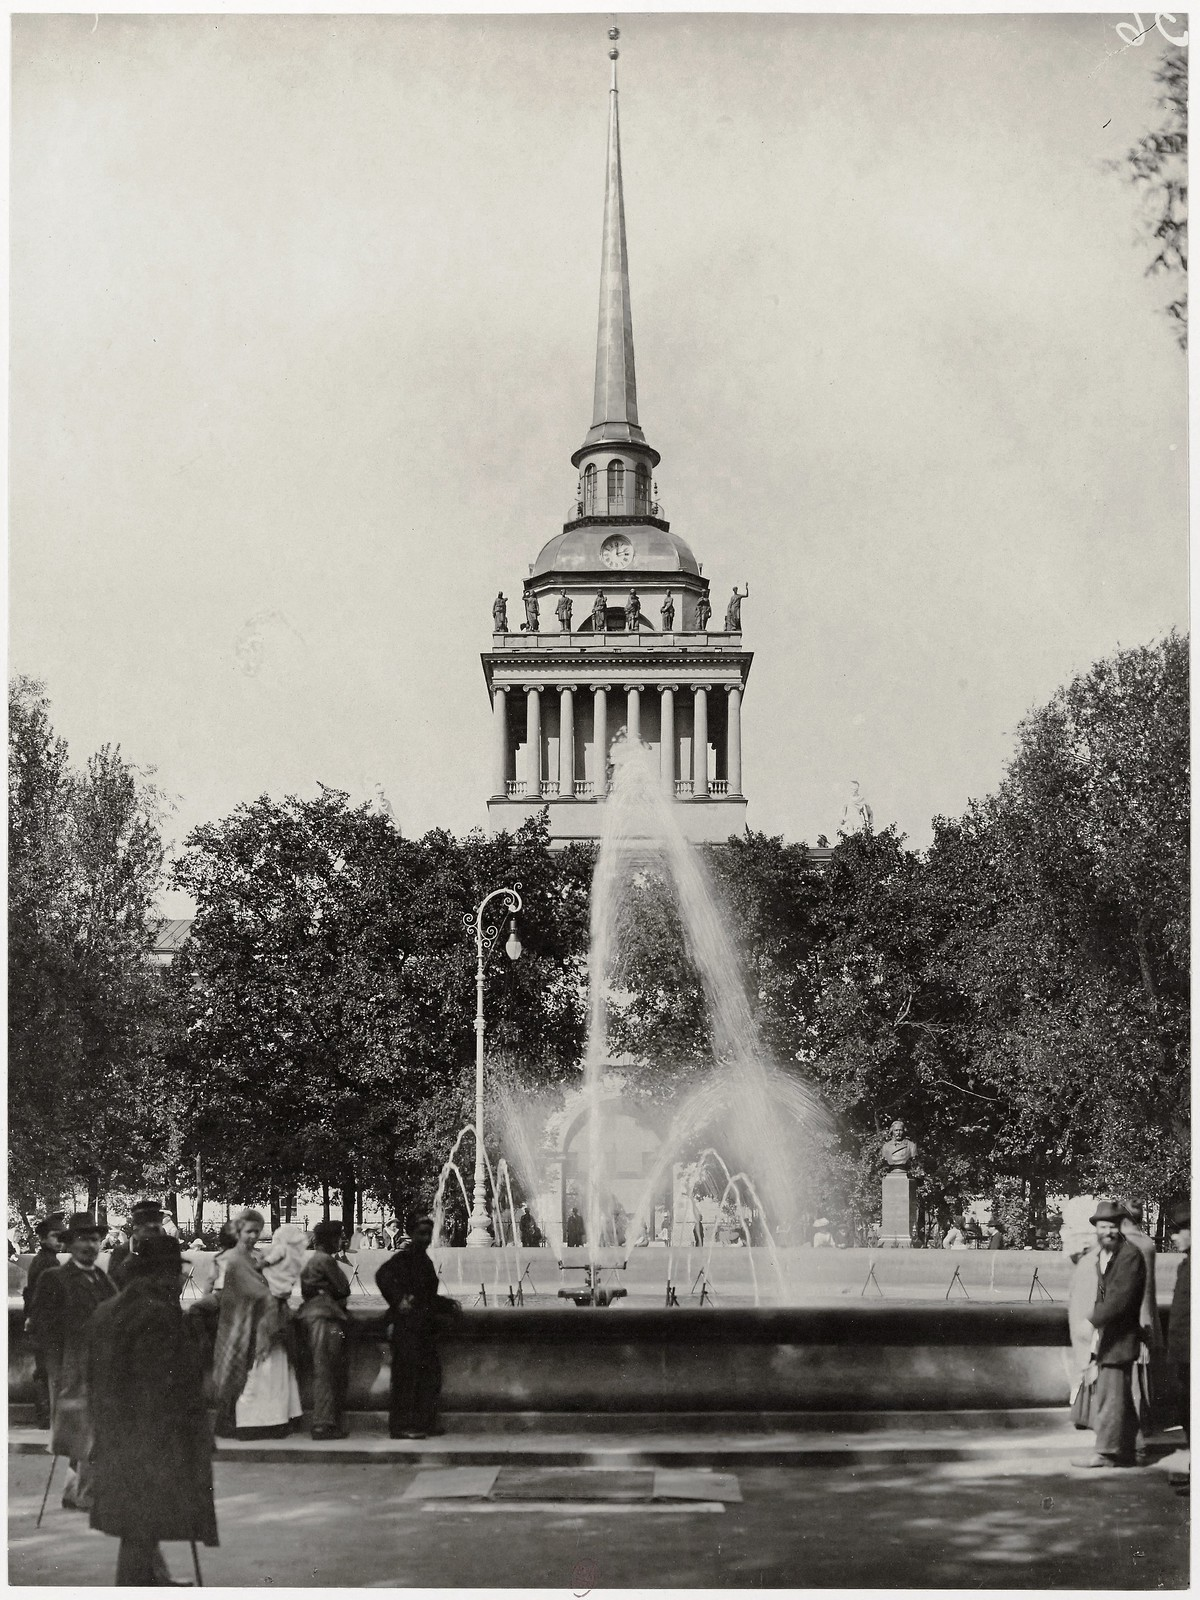 1904. Александровский сад, фонтан, Адмиралтейство